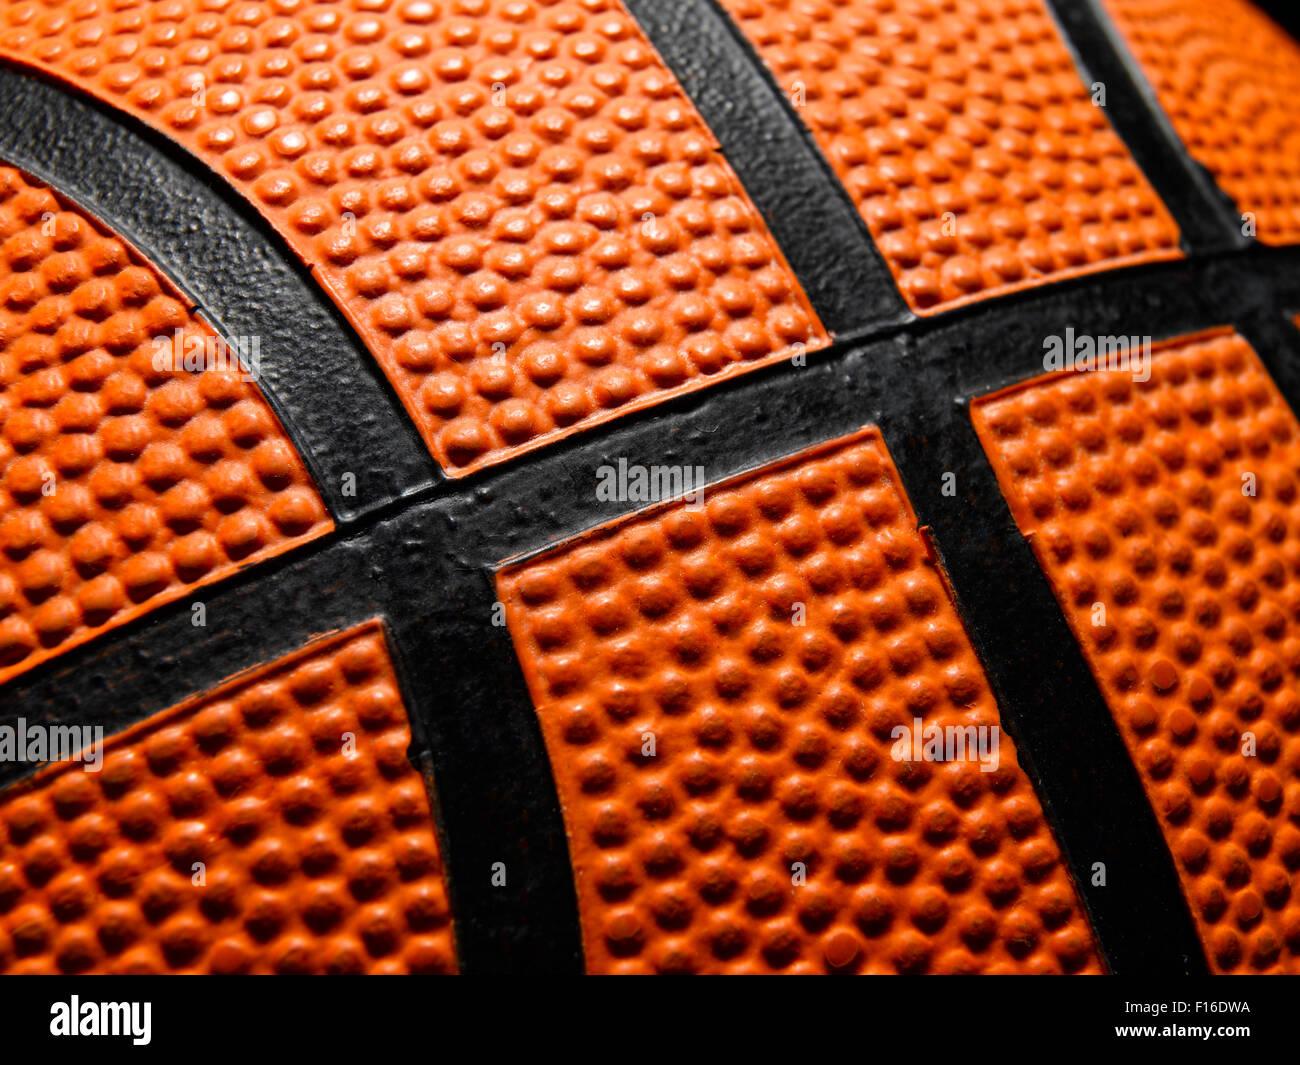 Unico Basket Immagini Stock